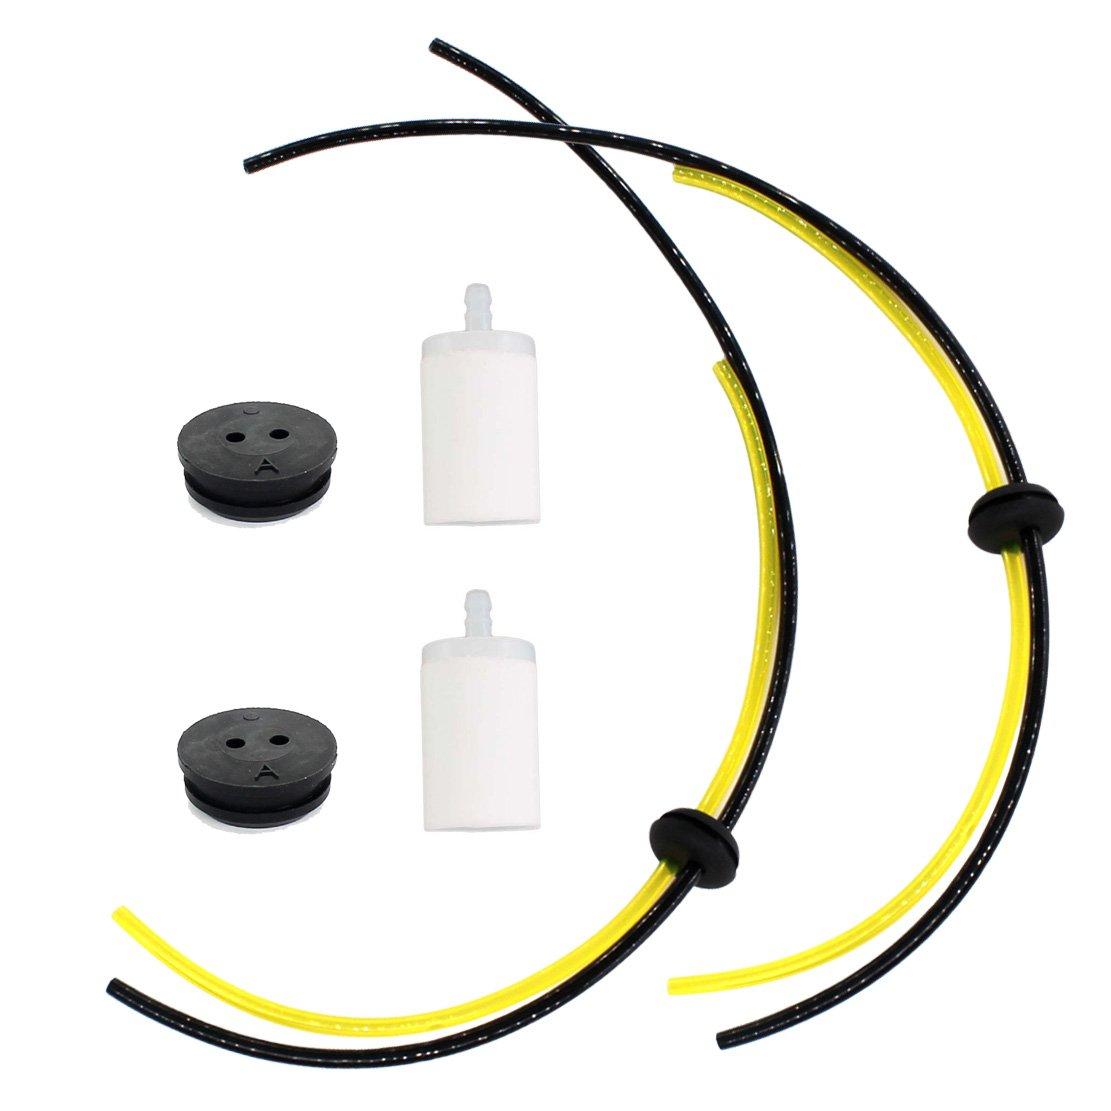 Amazon.com: USPEEDA Fuel Line Filter Kit For Stihl FS83 FC83 ...